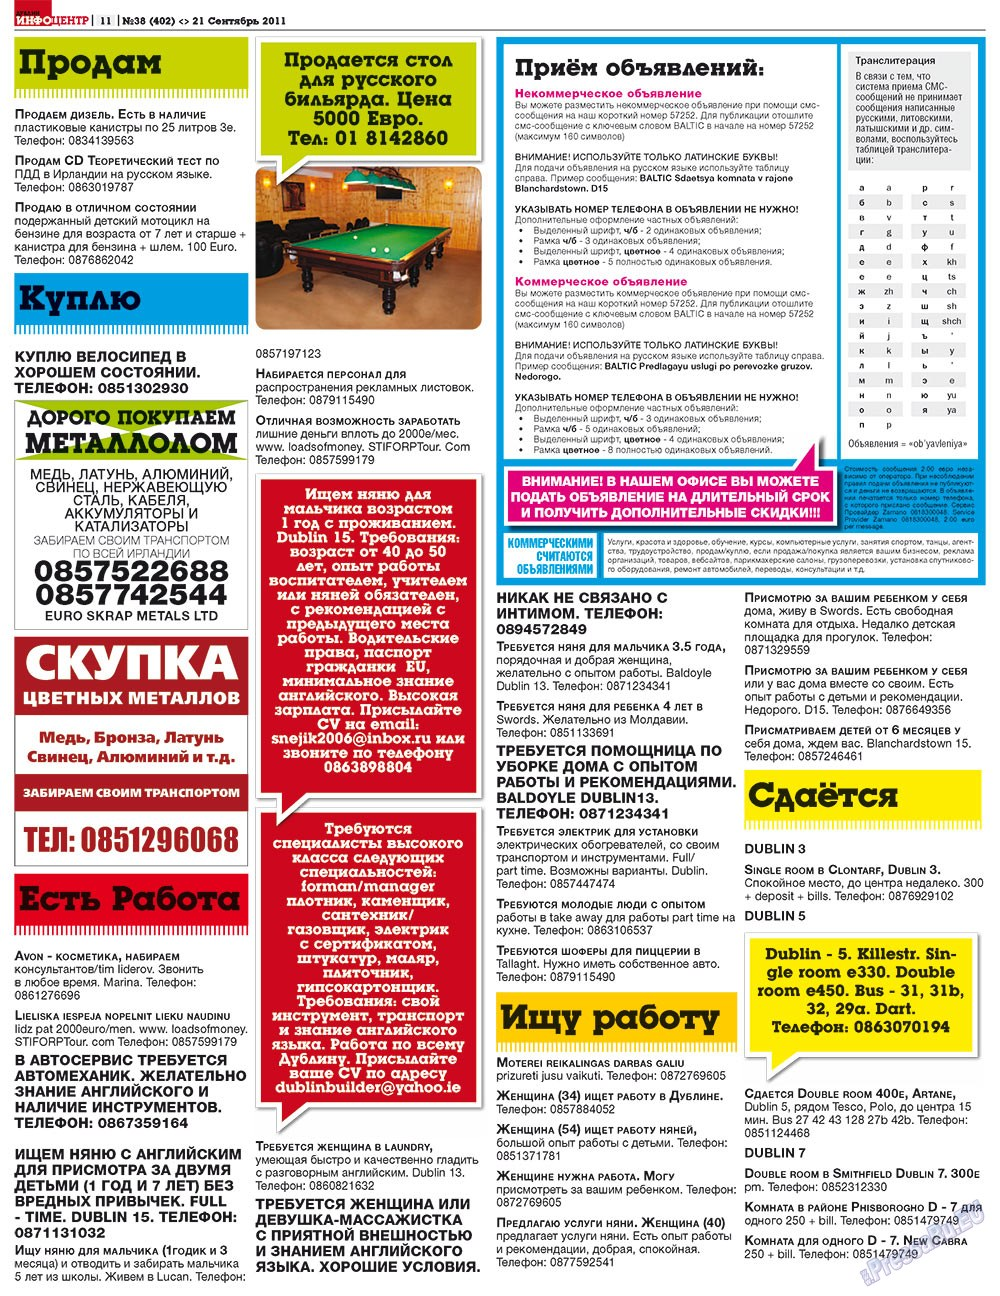 Дублин инфоцентр (газета). 2011 год, номер 38, стр. 11